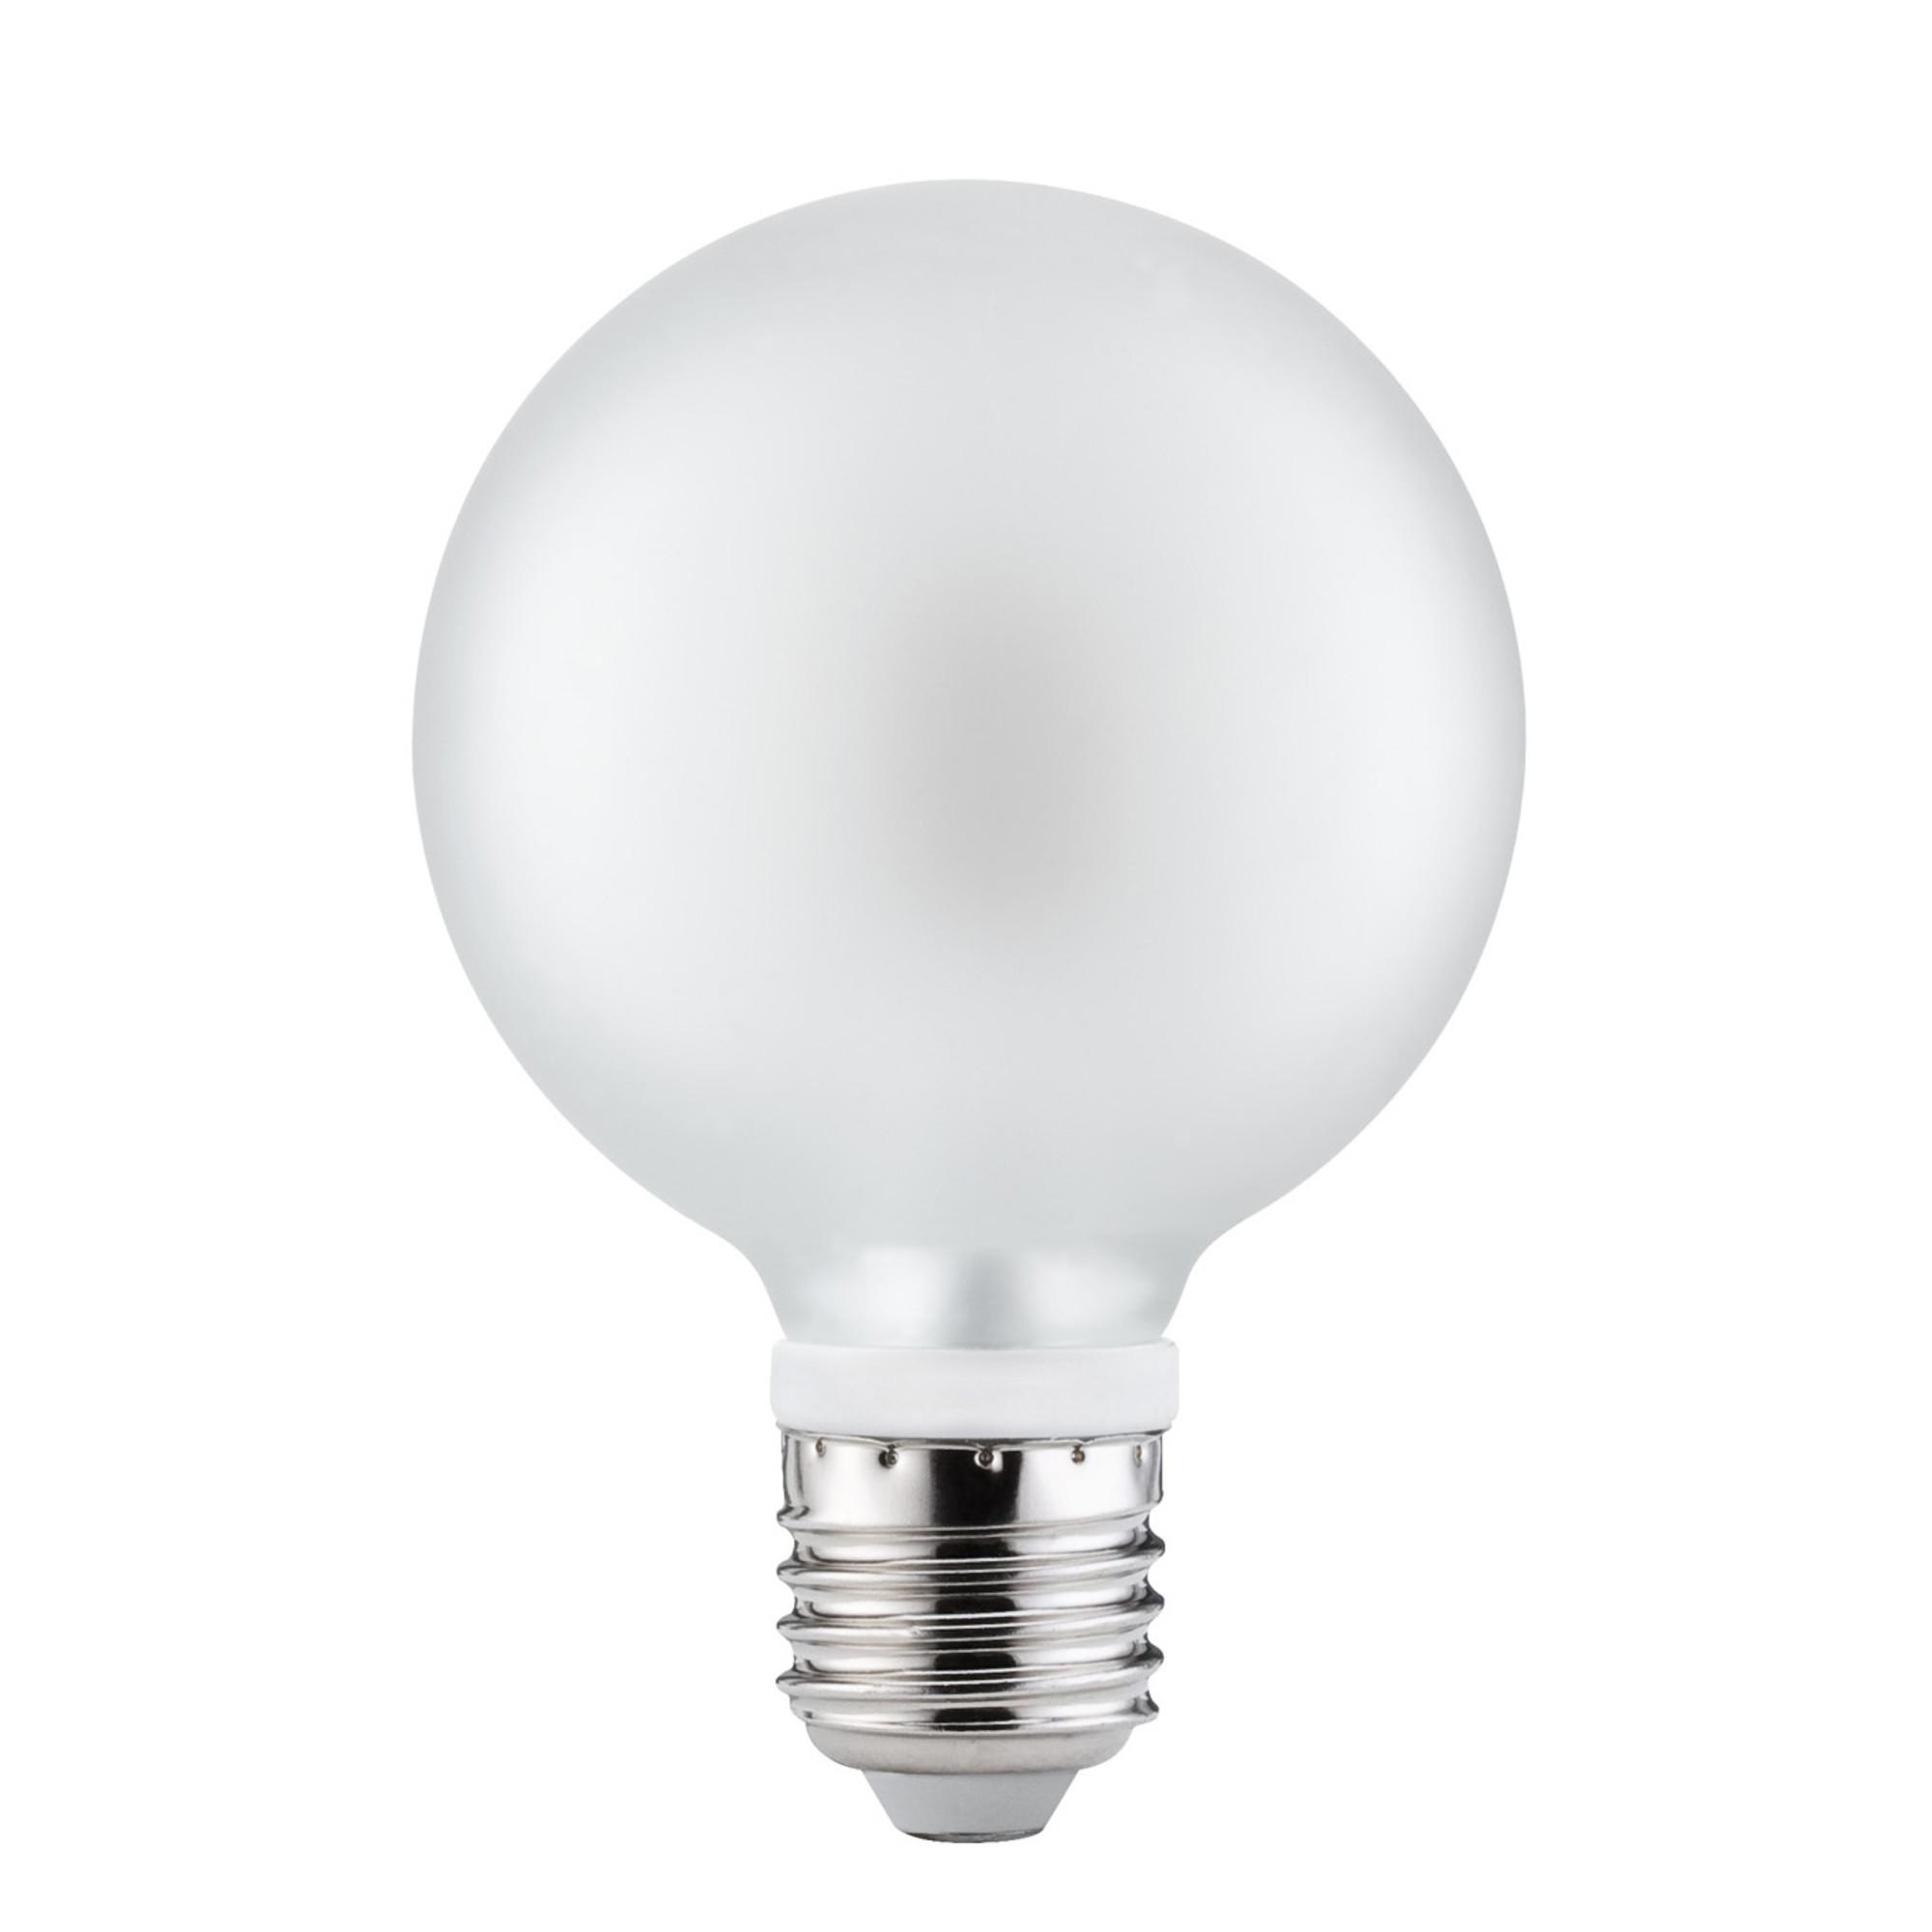 Лампа светодиодная Paulmann 28279 E27 470 Лм теплый свет